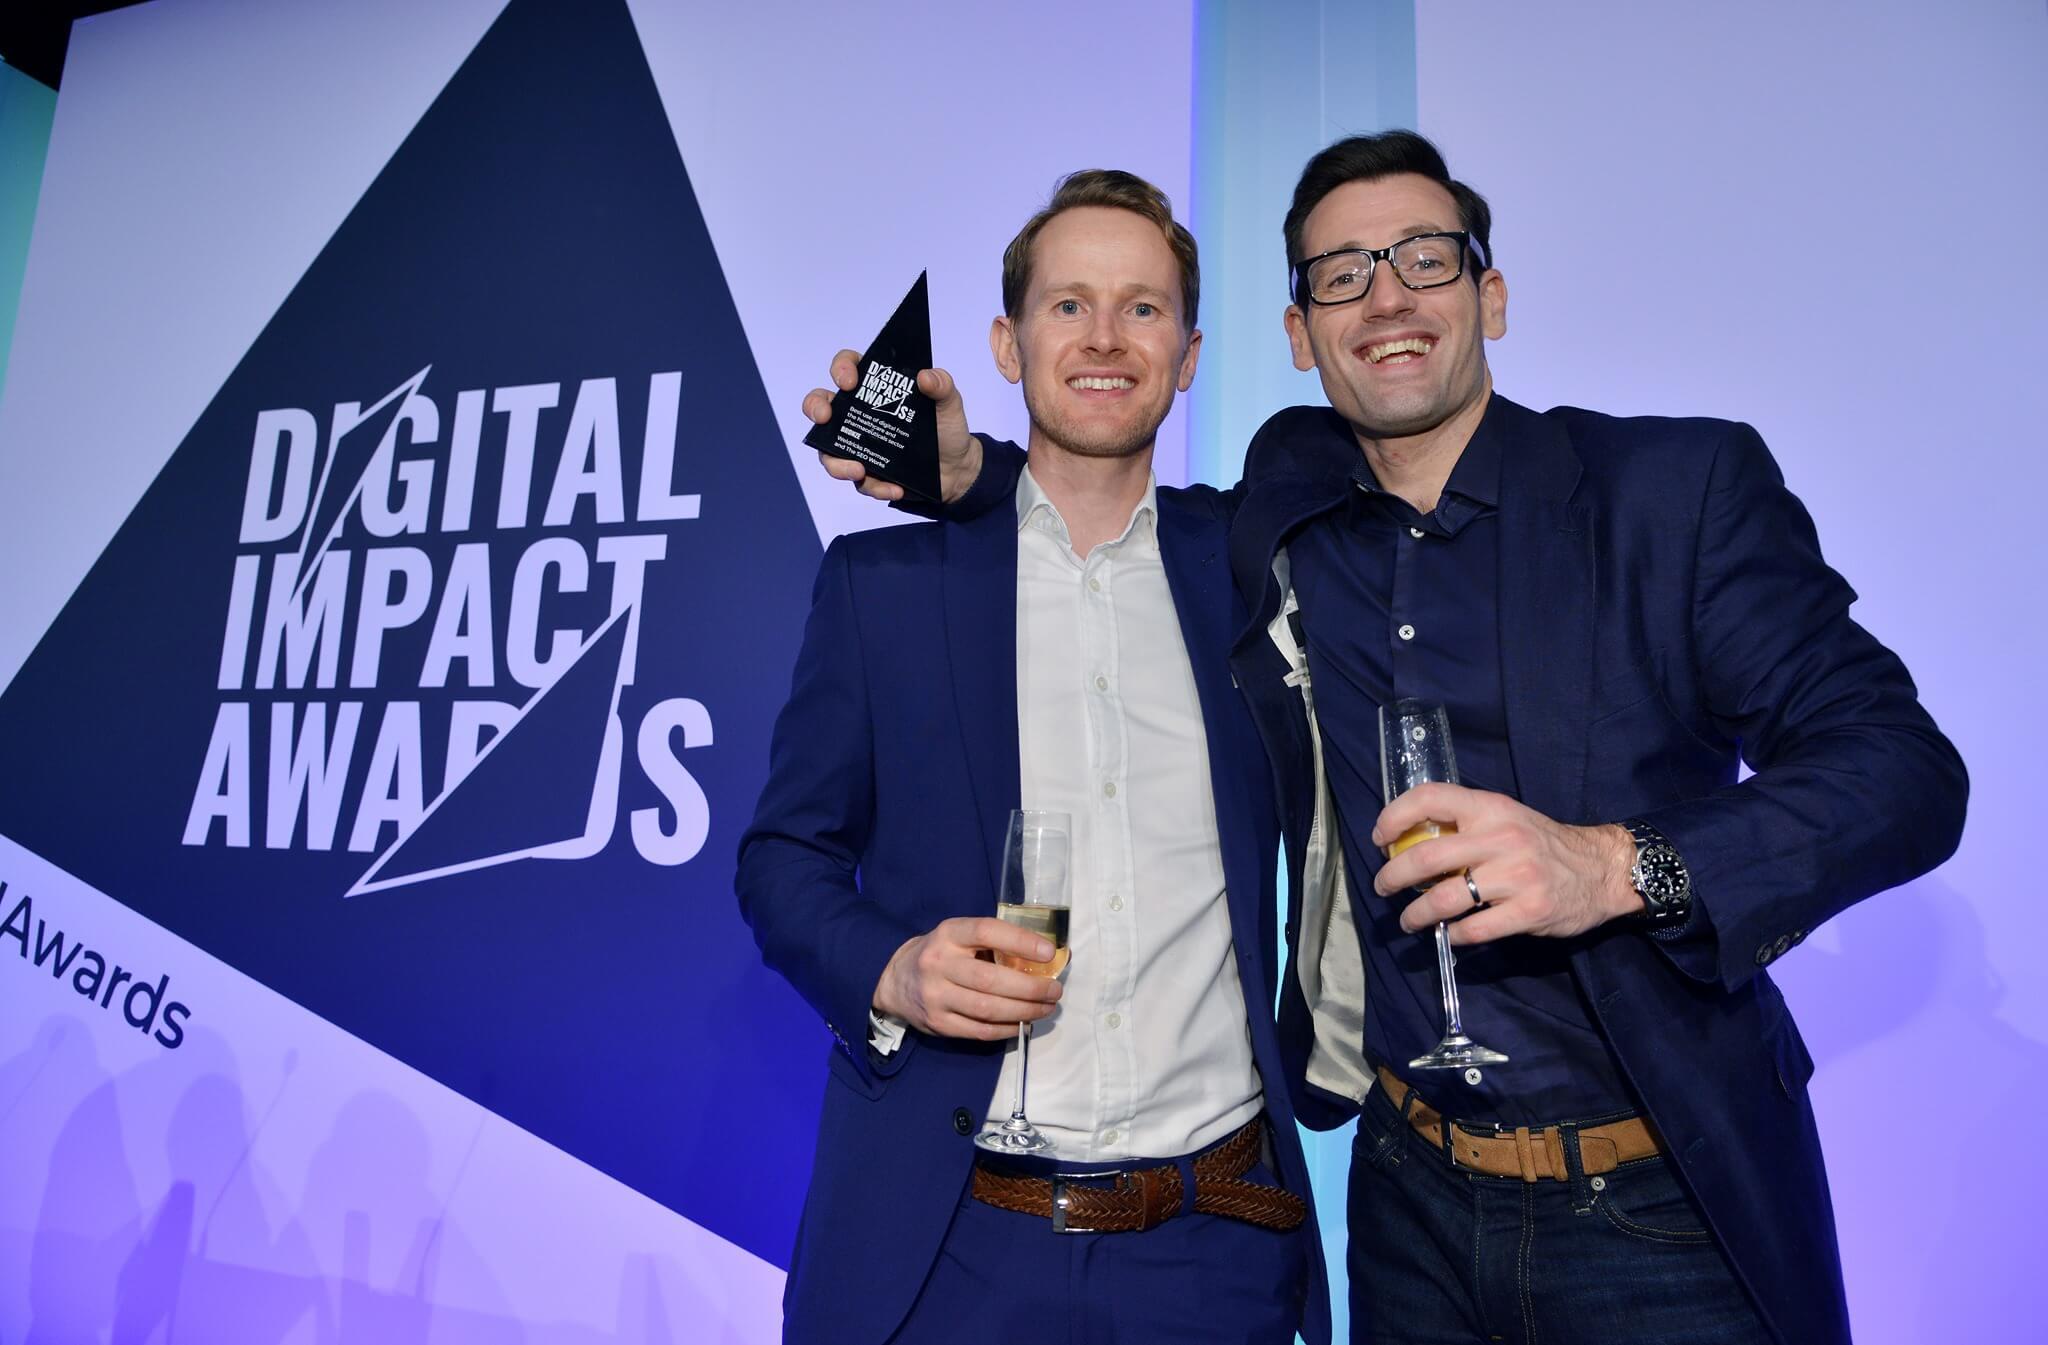 Digital Impact Awards Winner